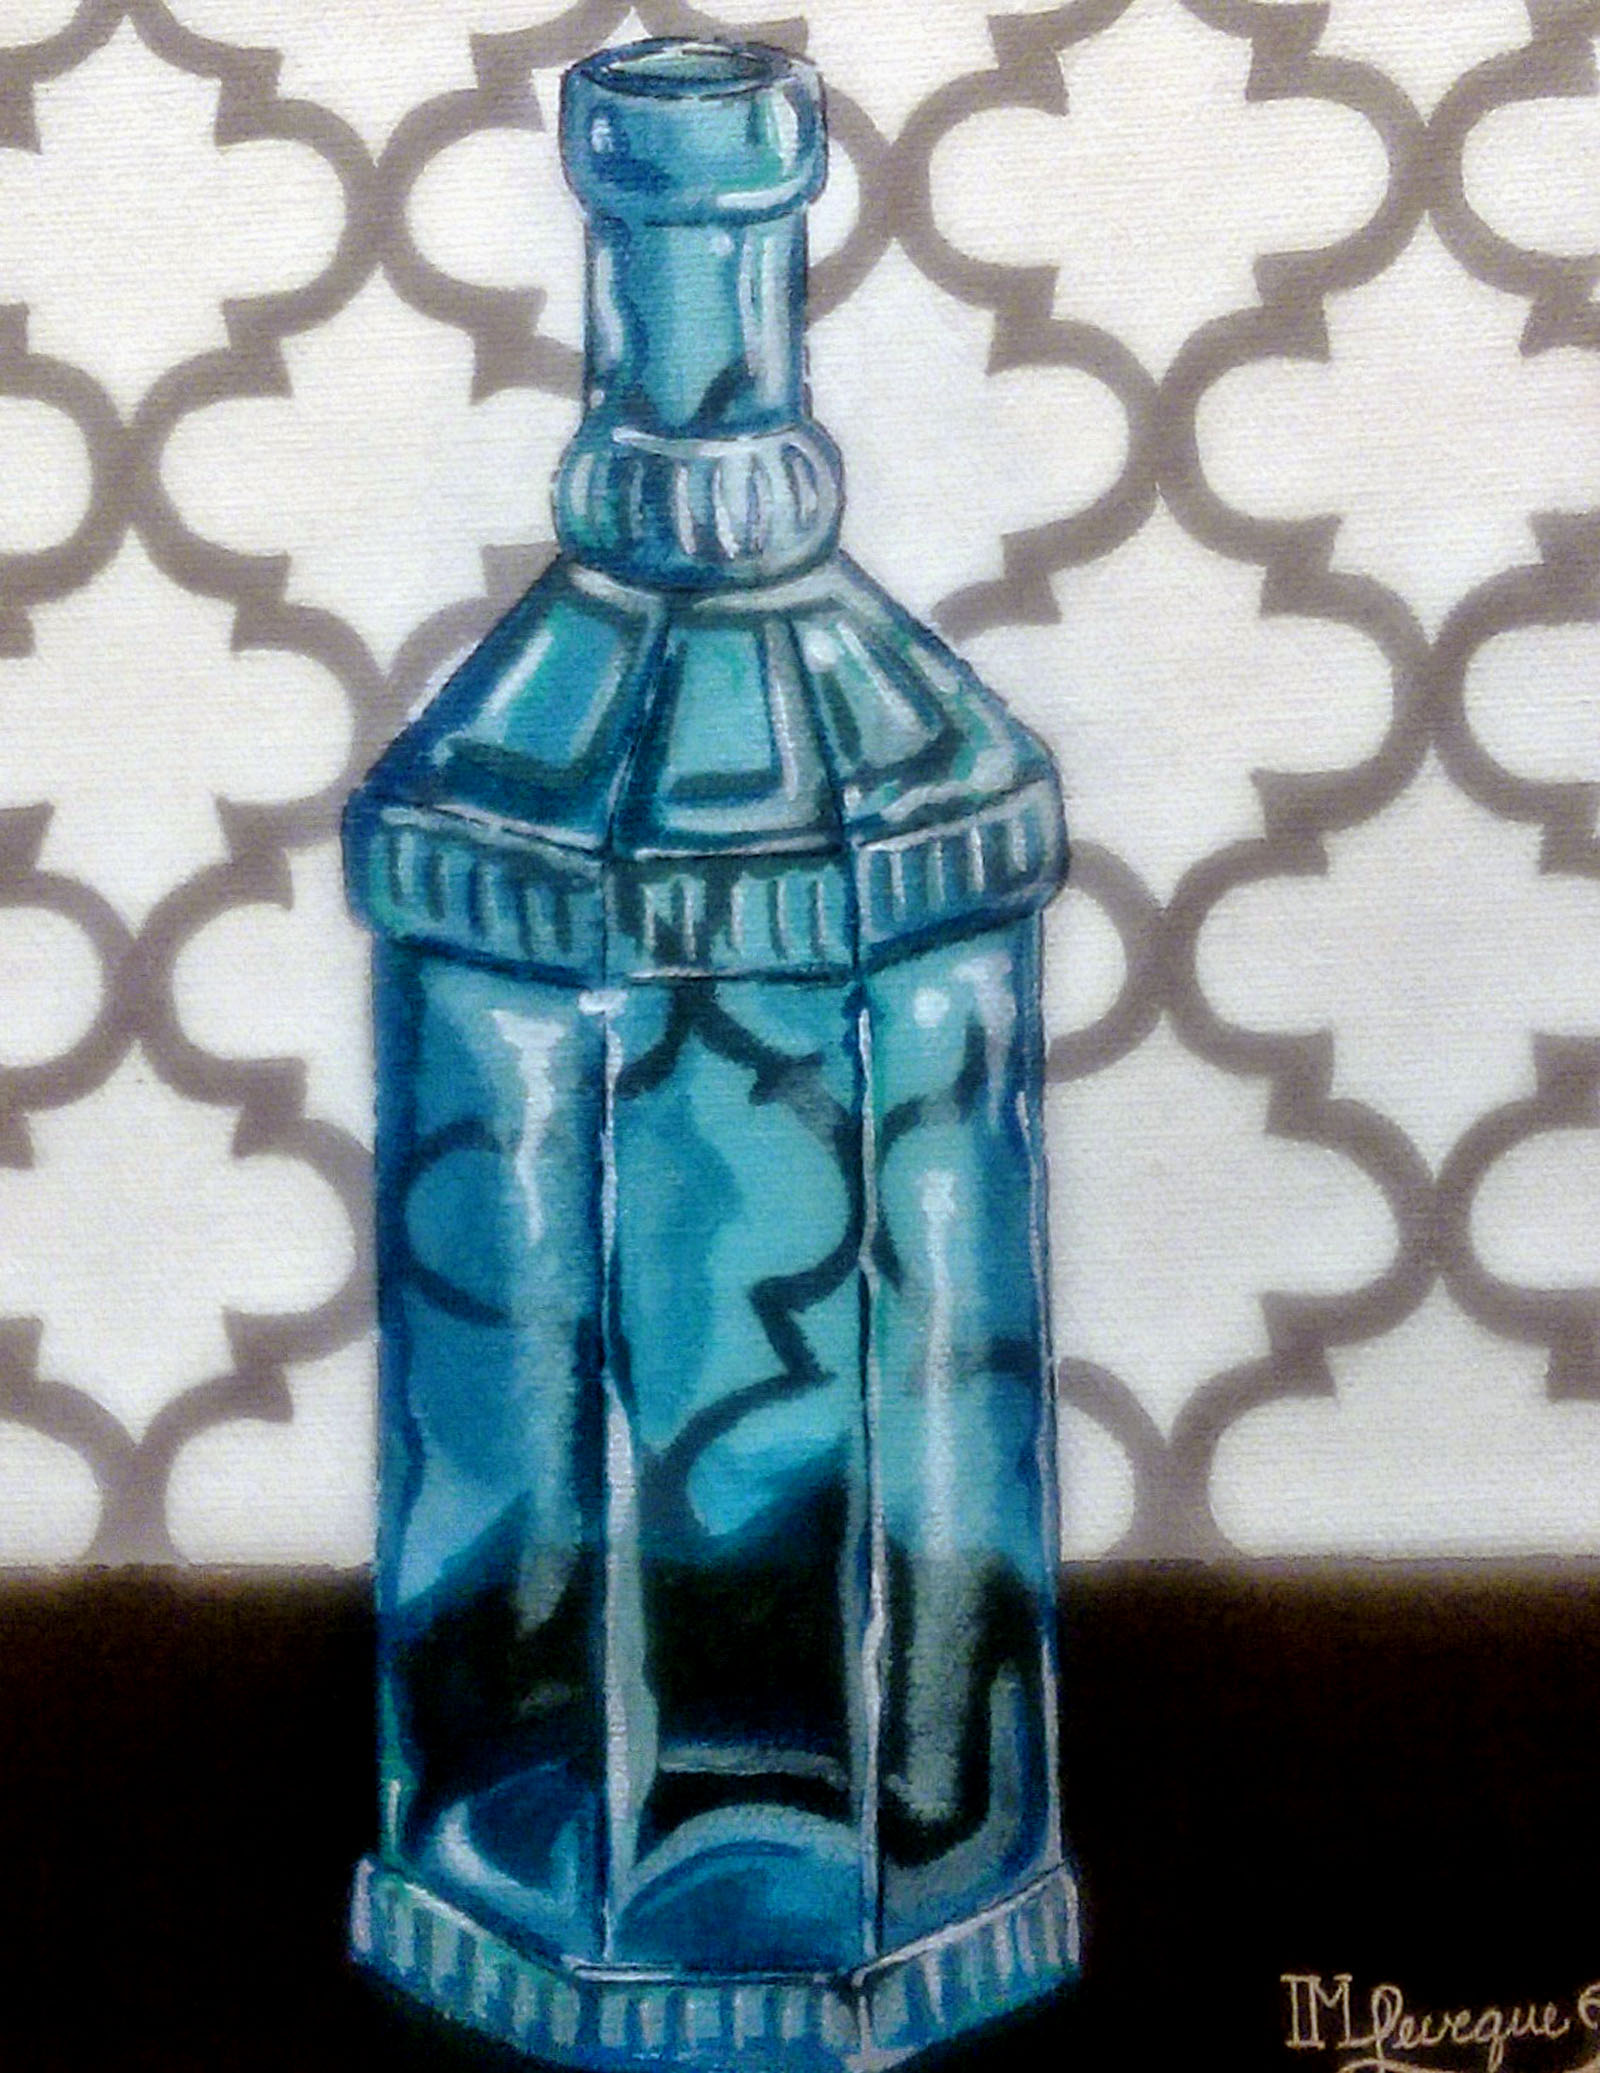 Bottle Study 1